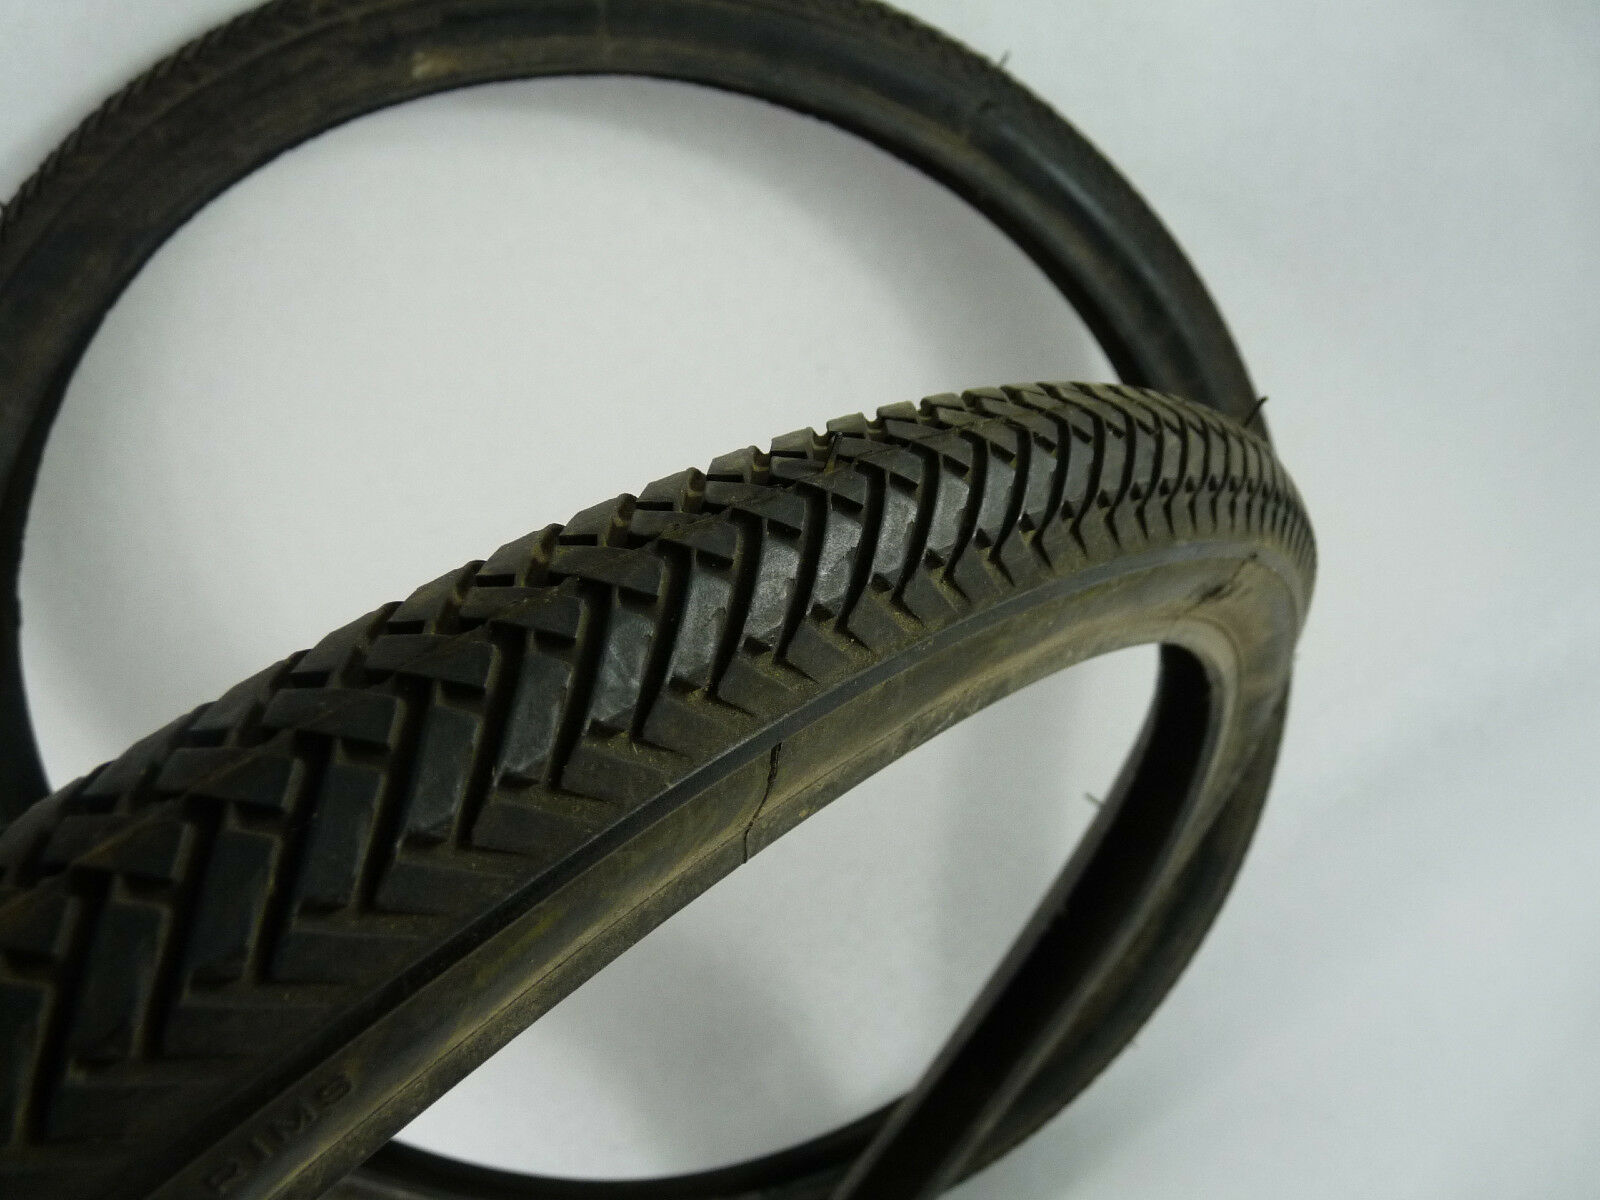 Carlisle tire Road Gripper 24x1.75 CLINCHER Schwilnn S-7 made in USA Vintage NOS